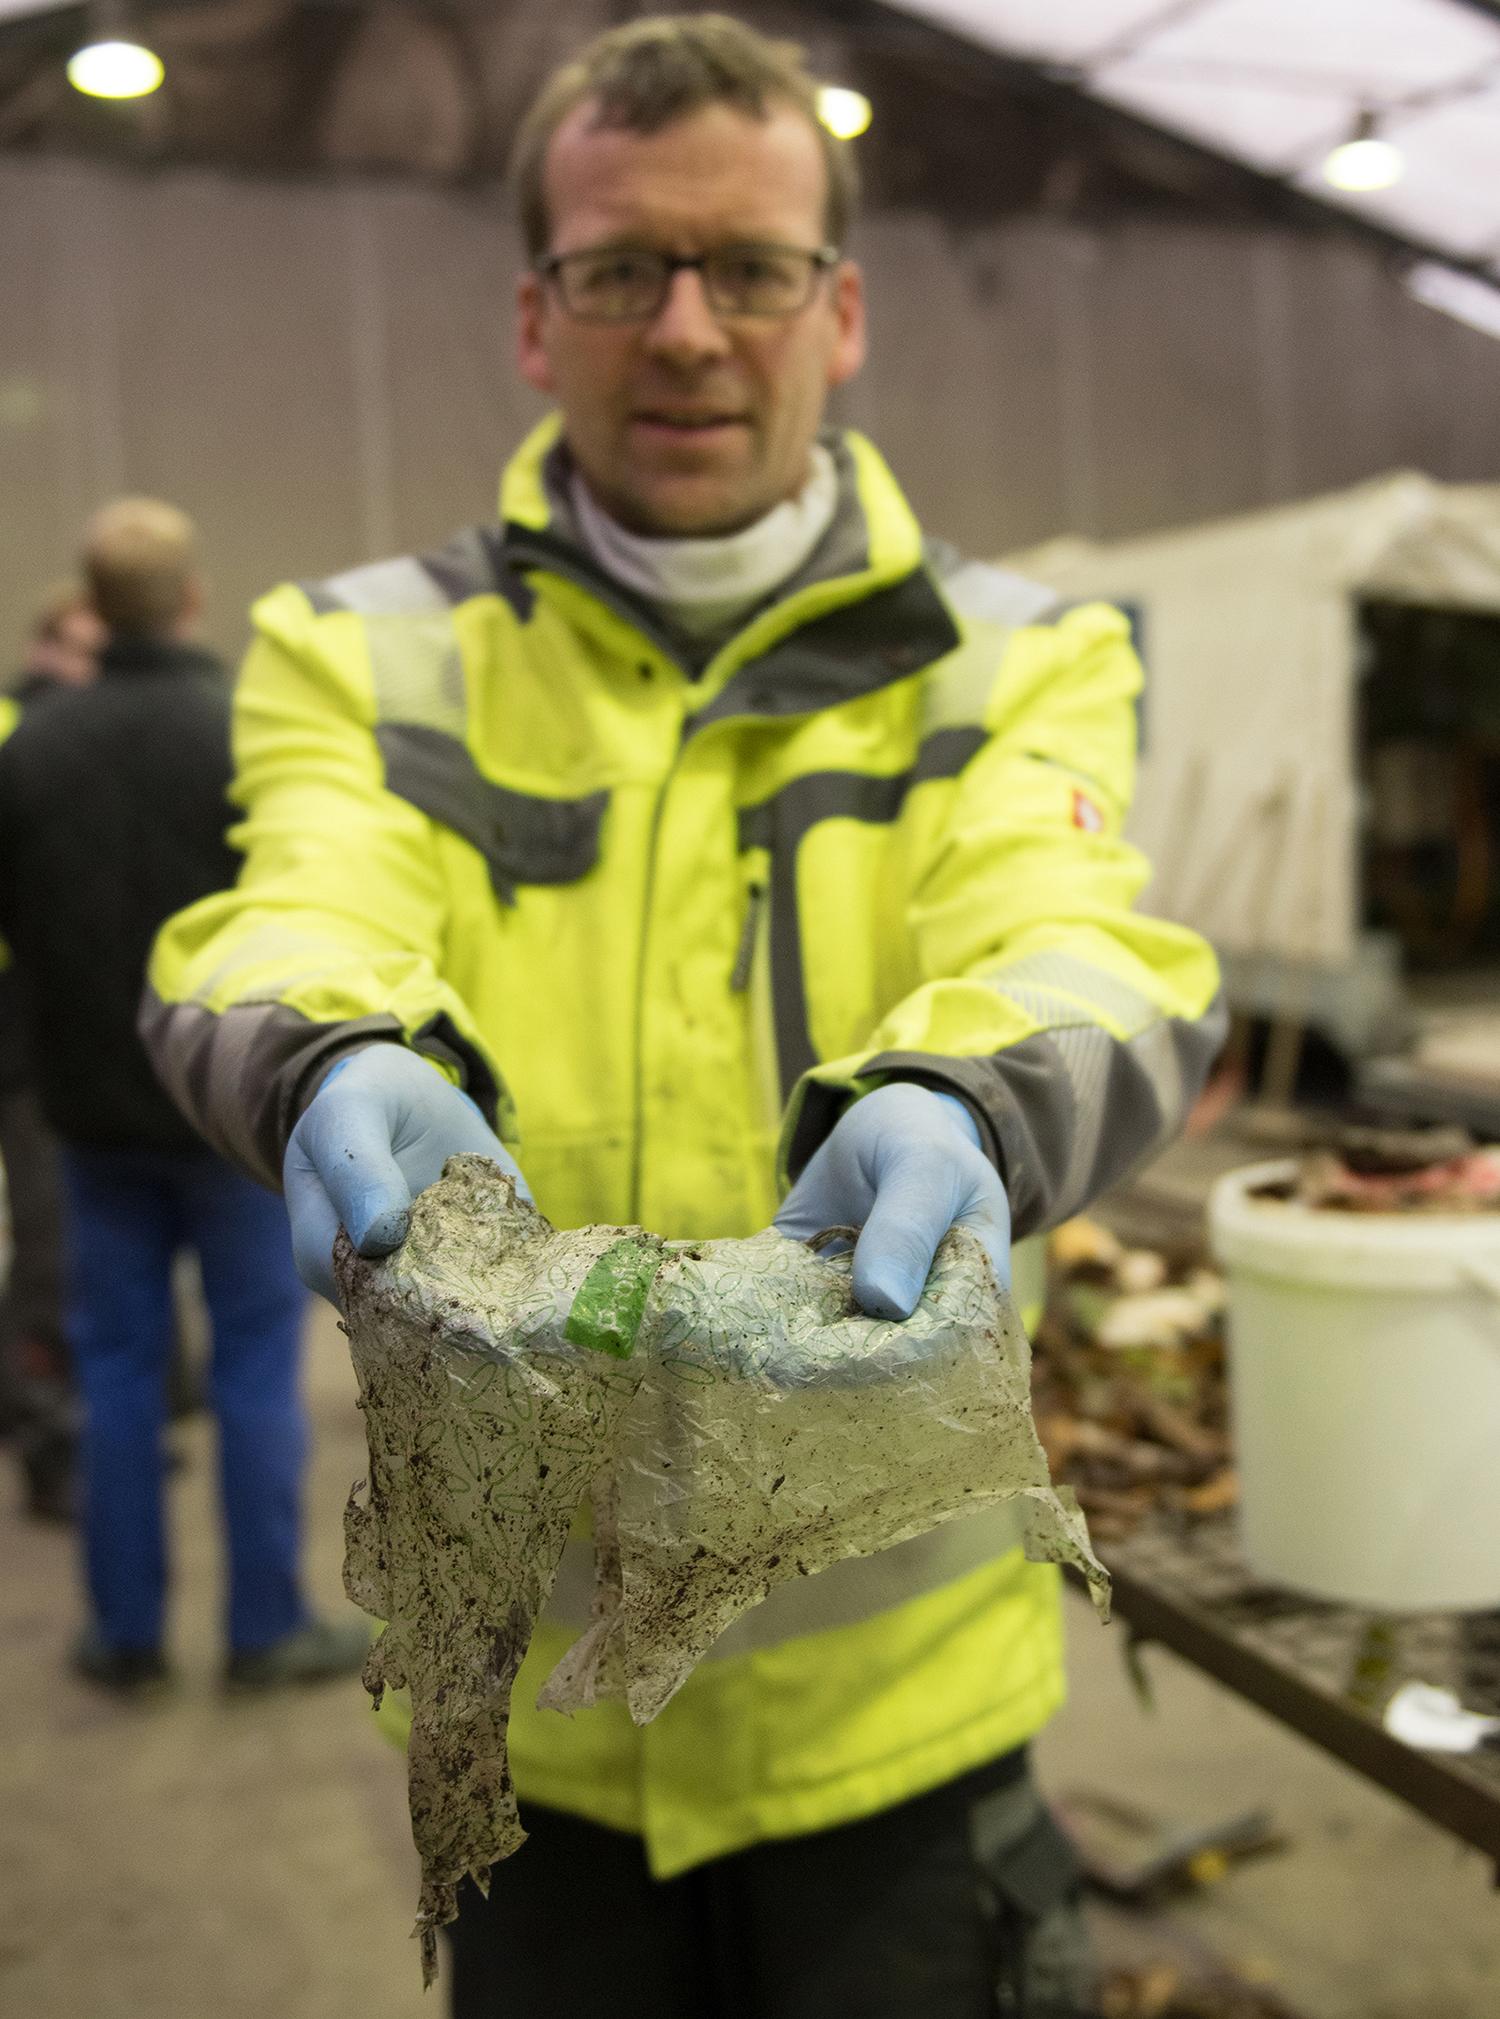 Thomas Bohmert hält Plastikreste in den Händen